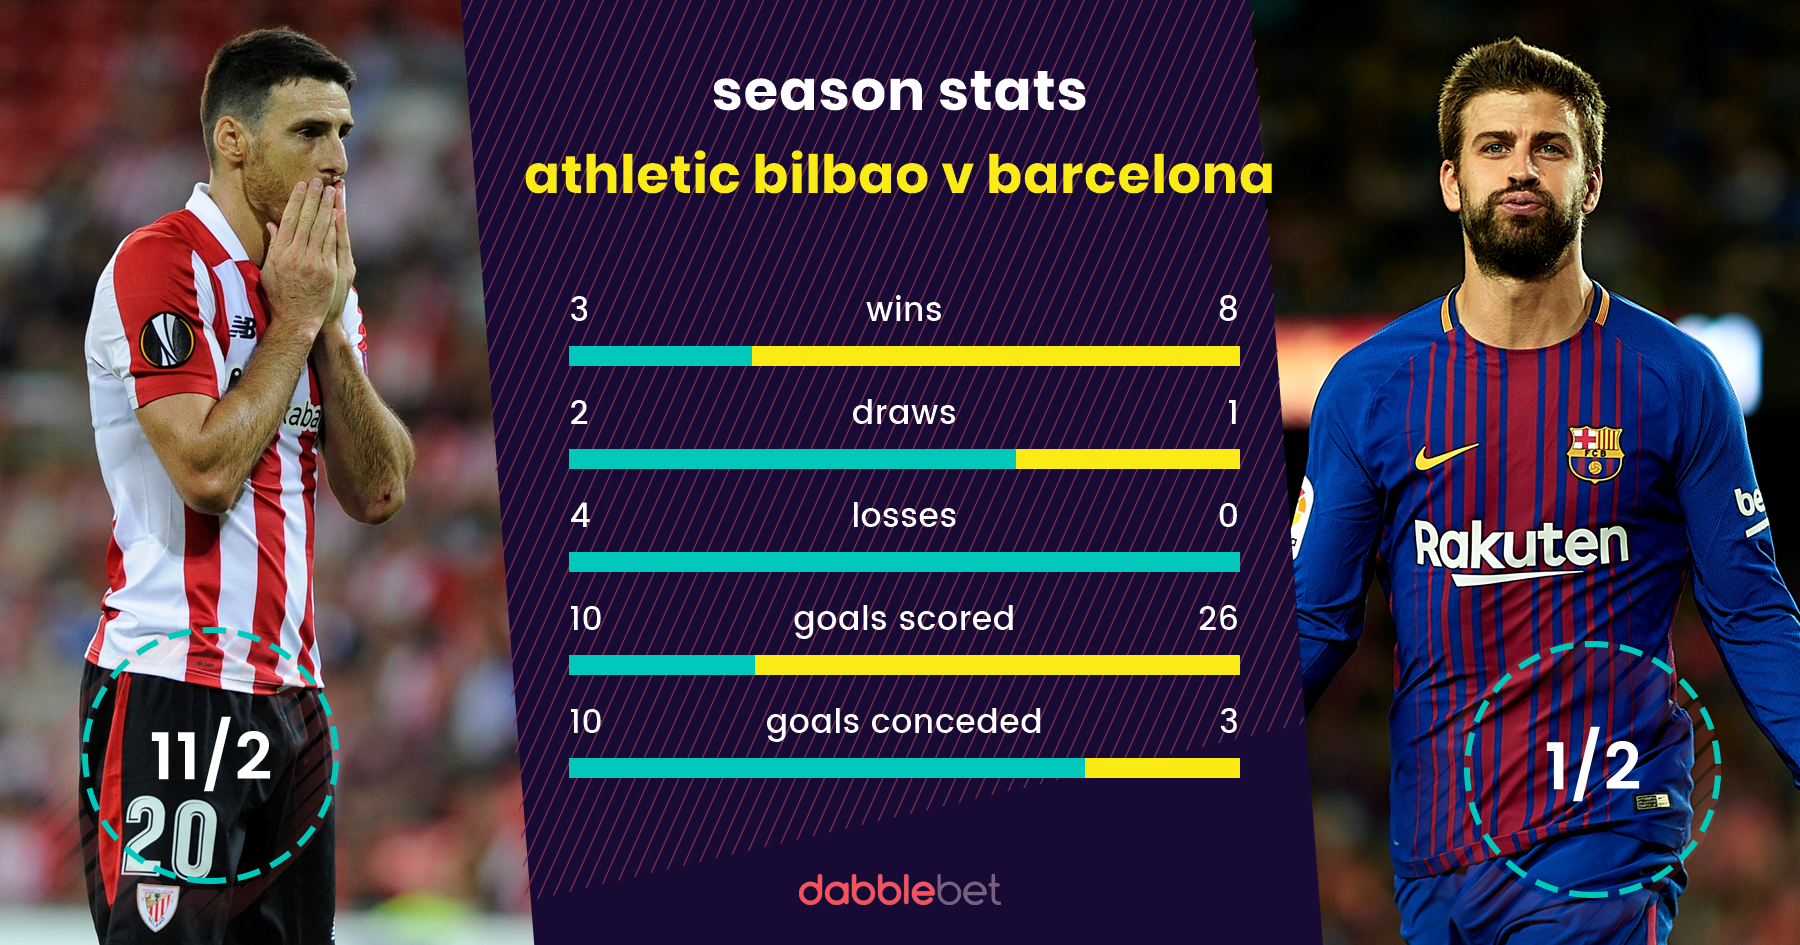 Bilbao Barcelona graphic